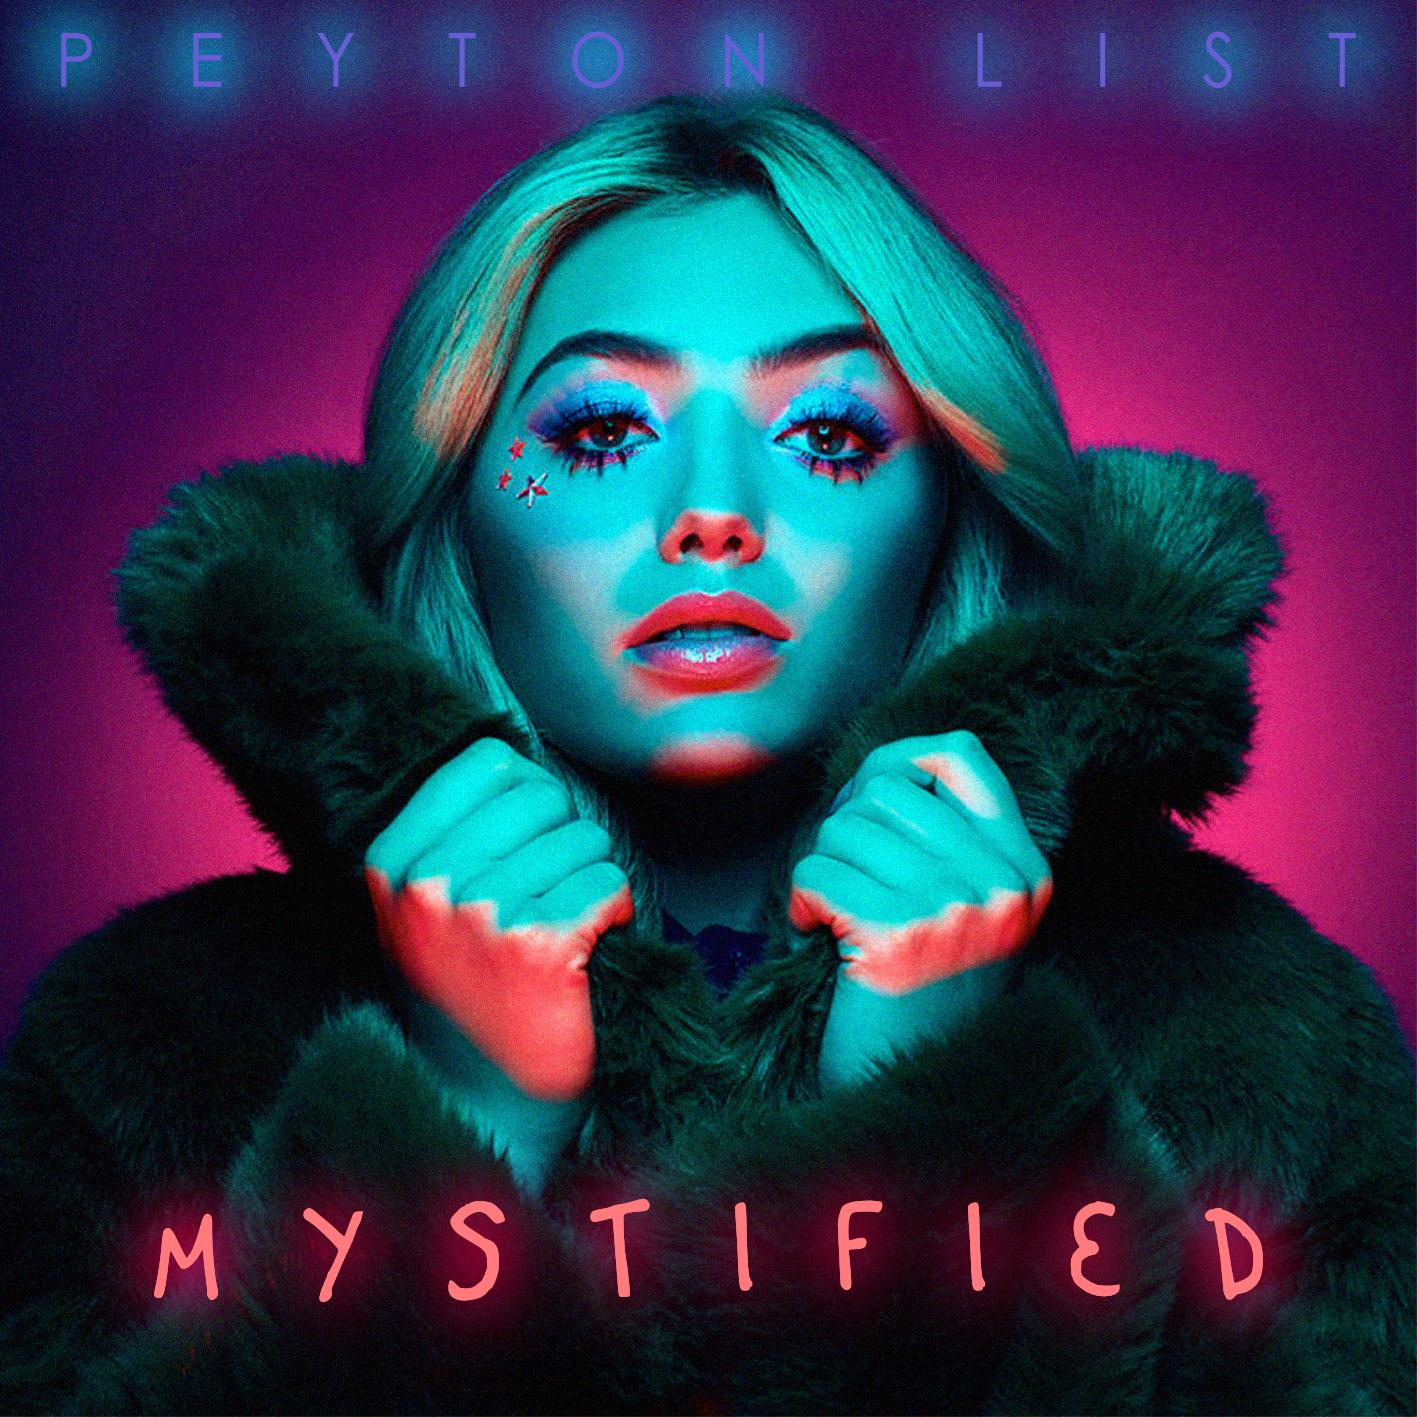 Mystified (Peyton List album)